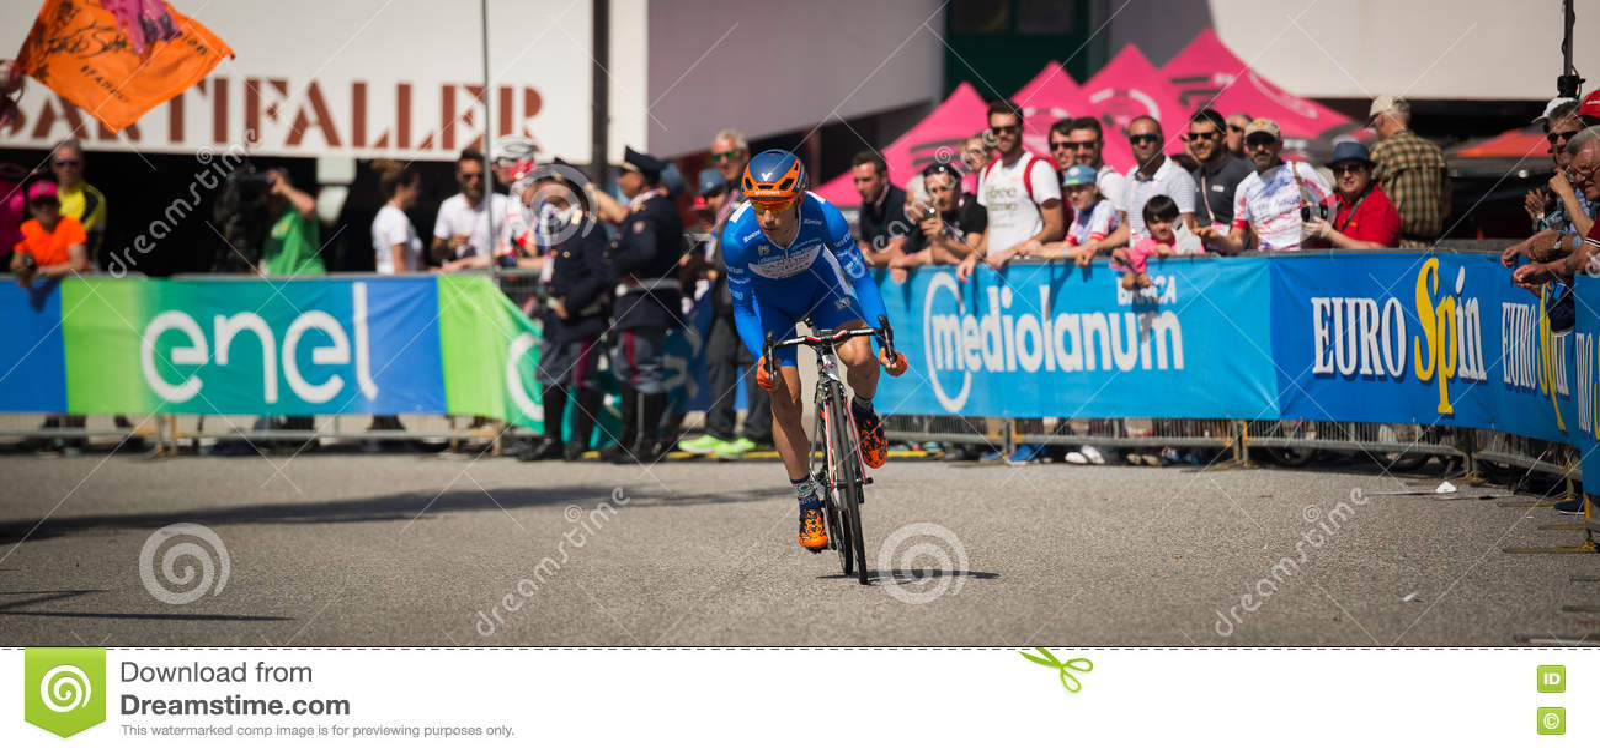 Castelrotto, Ιταλία στις 22 Μαΐου 2016  Ο επαγγελματικός ποδηλάτης κατά τη διάρκεια μιας δοκιμής δυσκολίας αναρριχείται